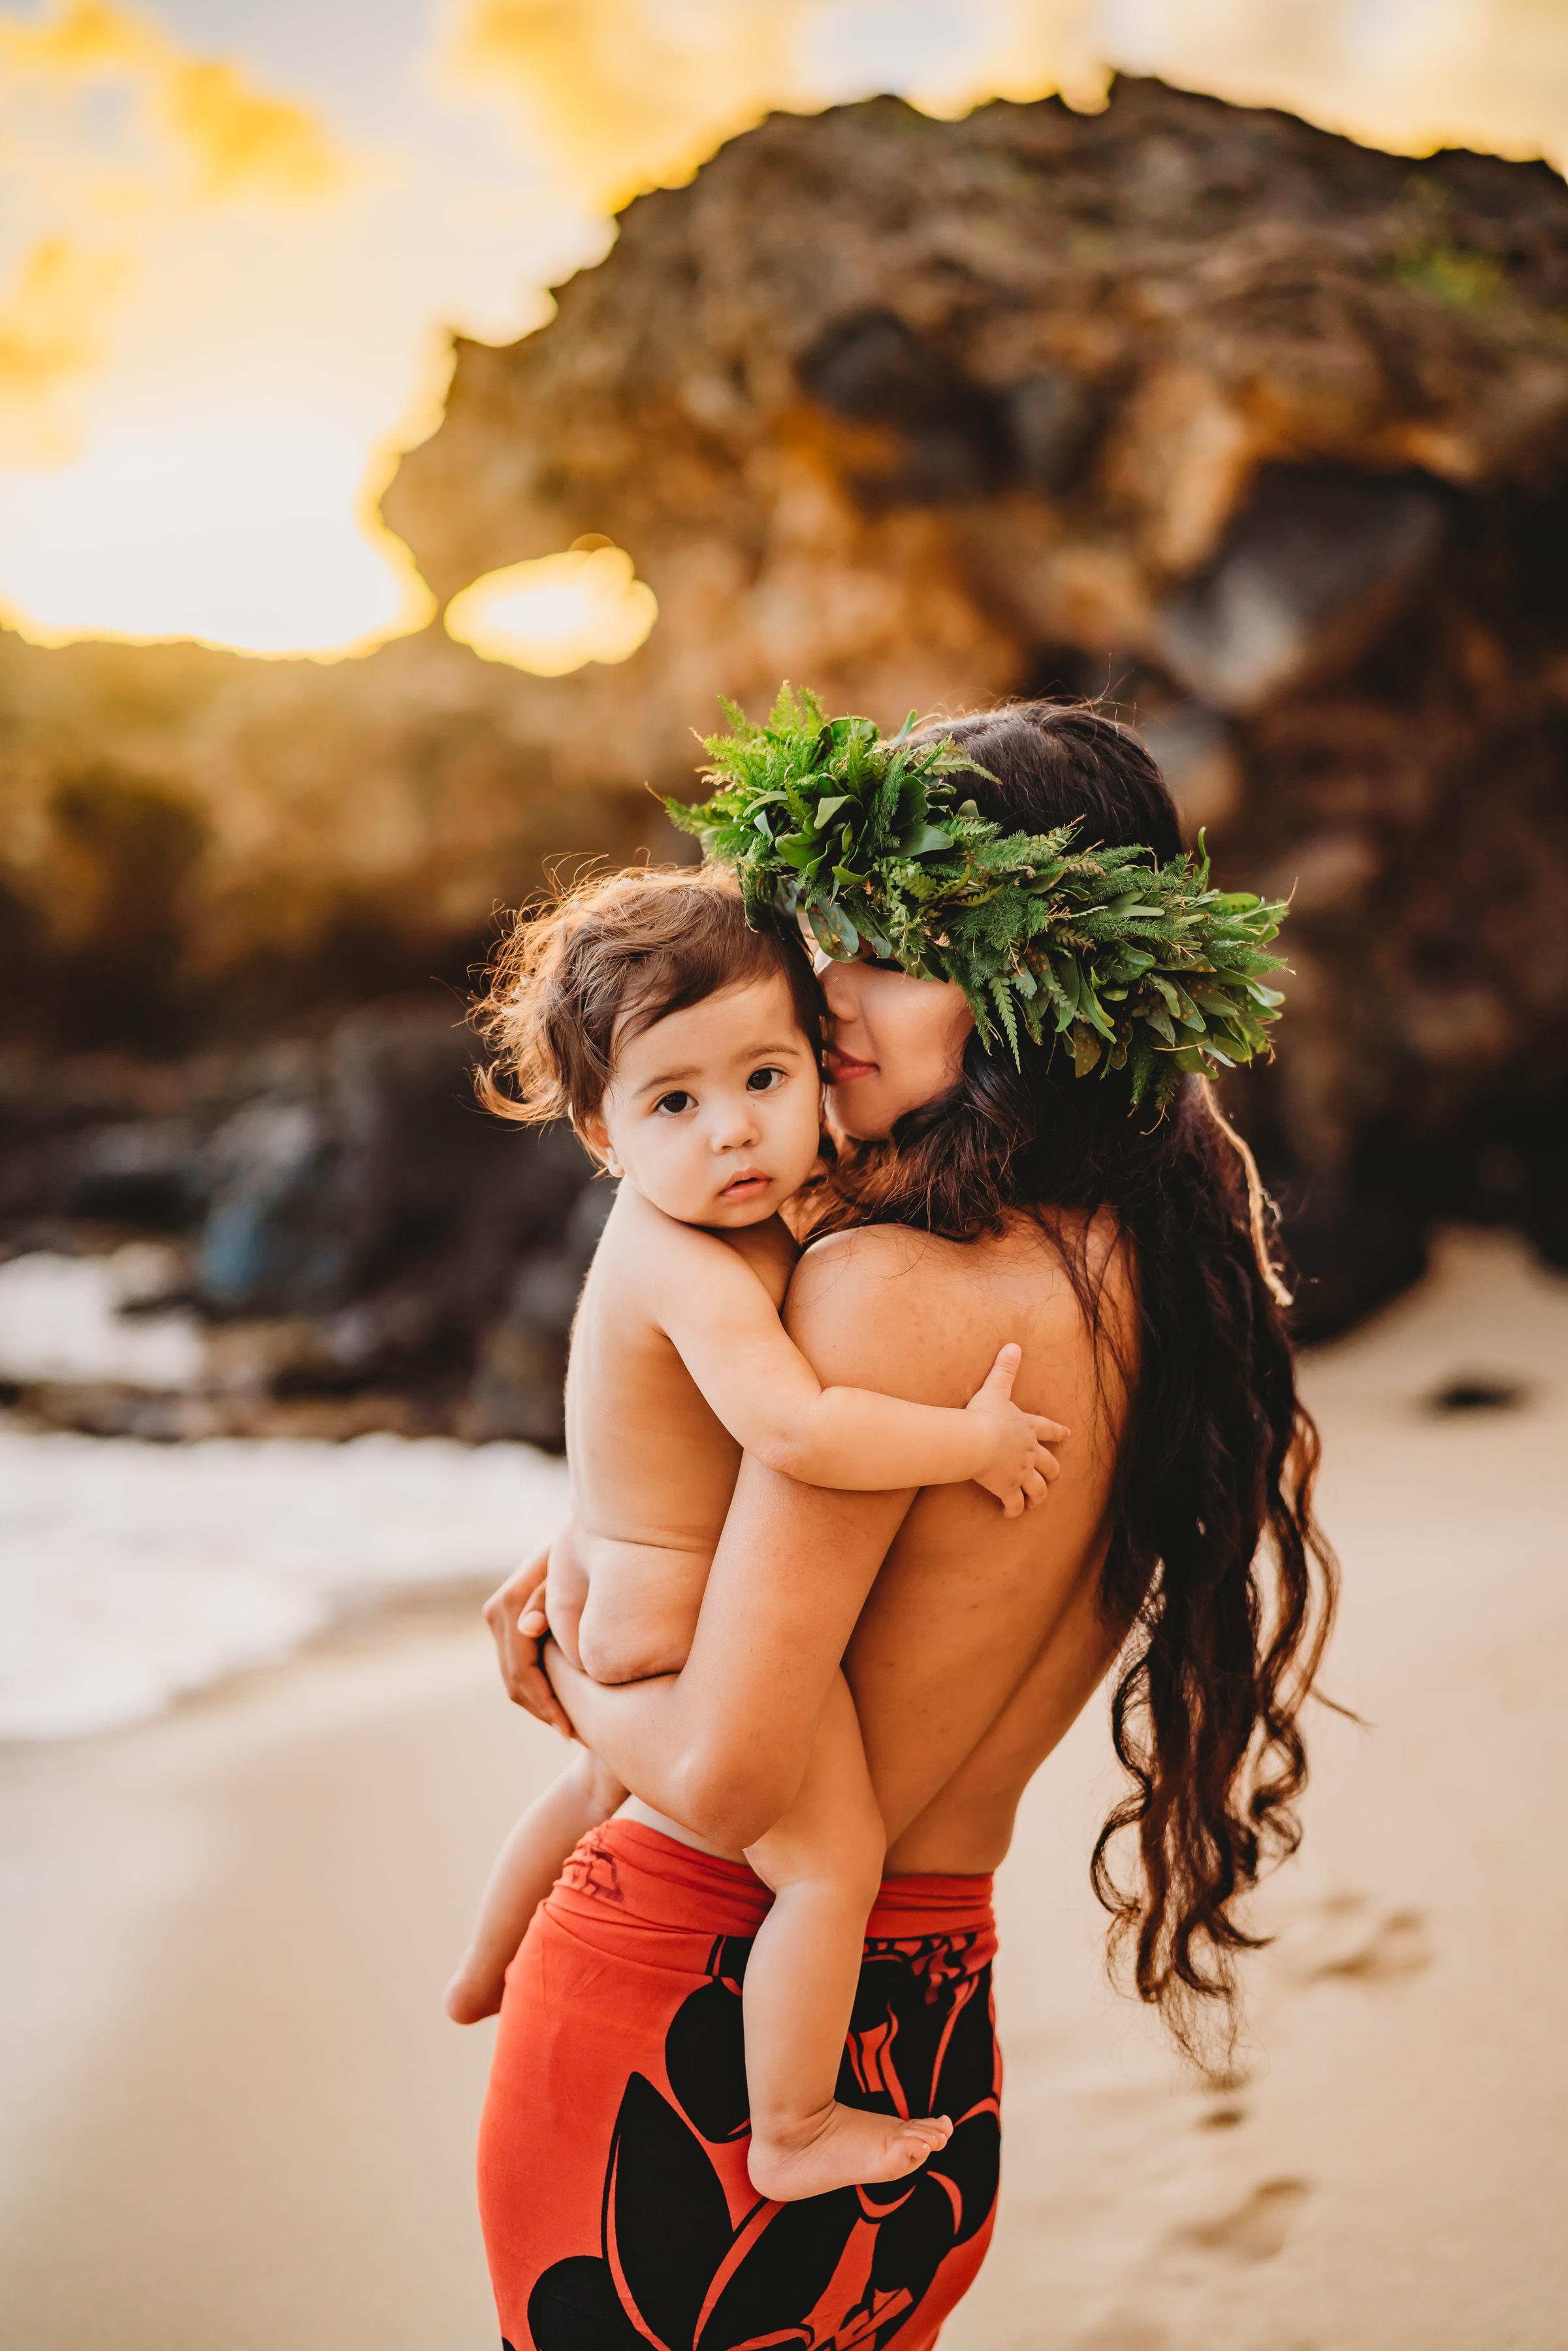 Oahu-Hawaii-Family-Photographer-haku-lei-mother-daughter-beach-session-6.jpg